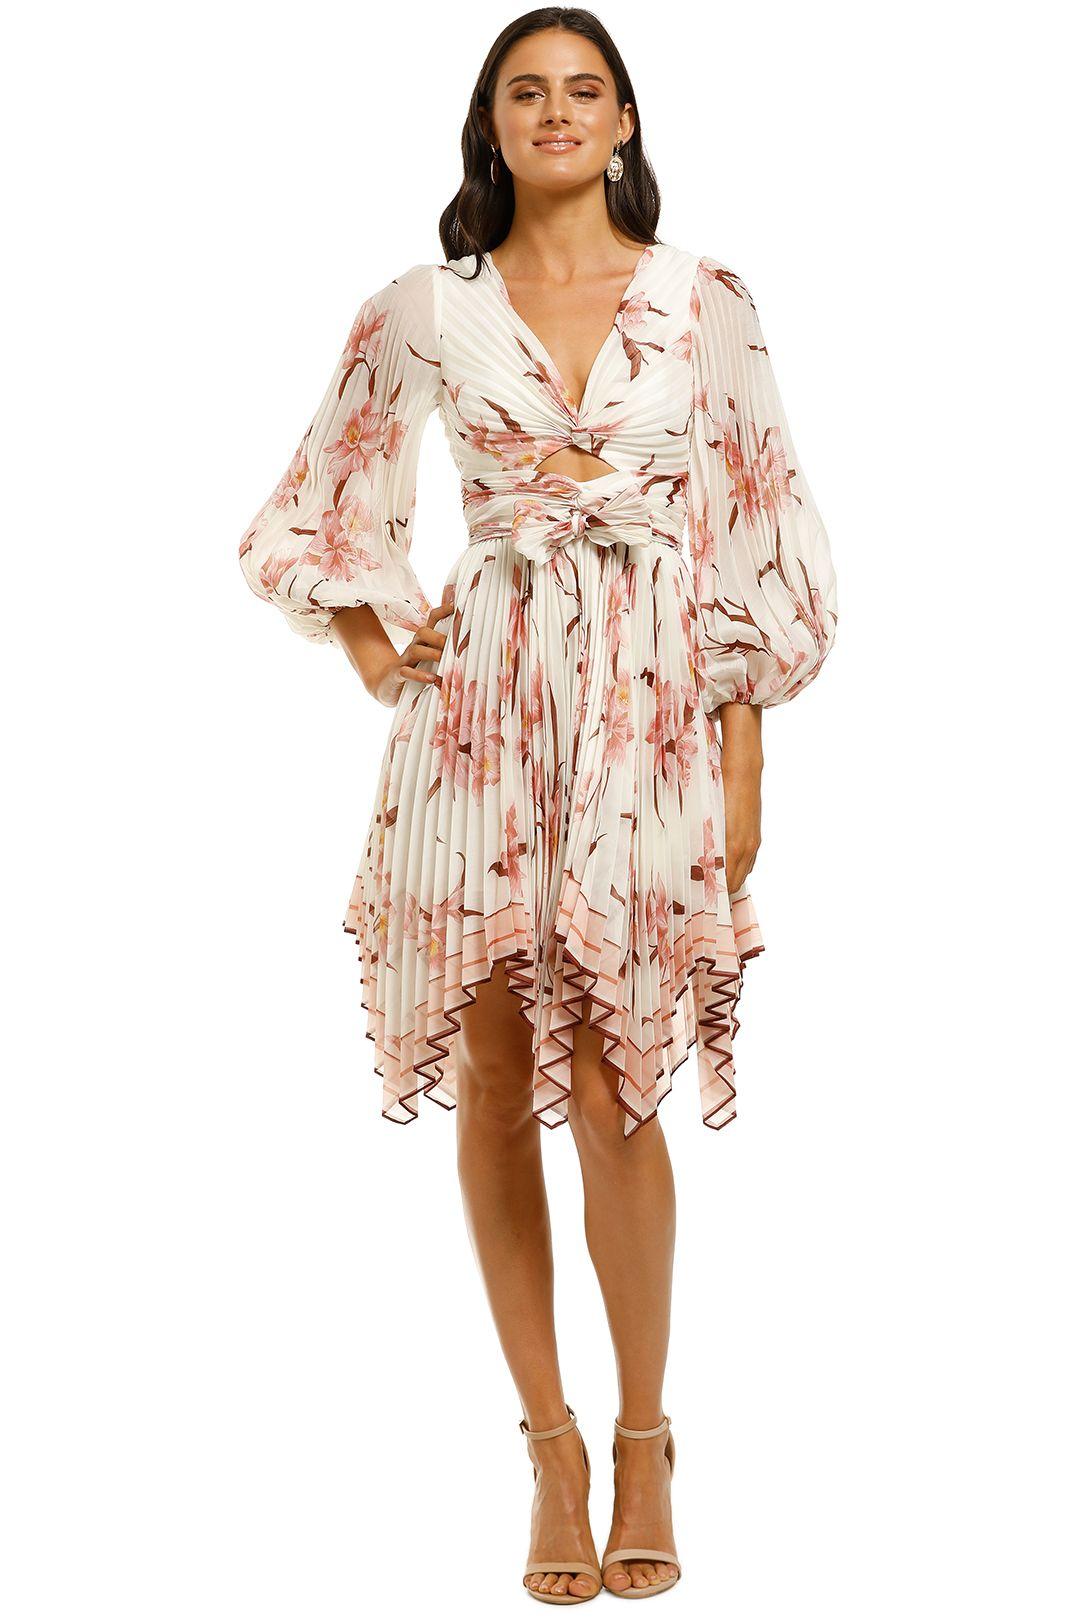 Zimmermann-Corsage-Pleat-Mini-Dress-Ivory-Peach-Orchid-Front